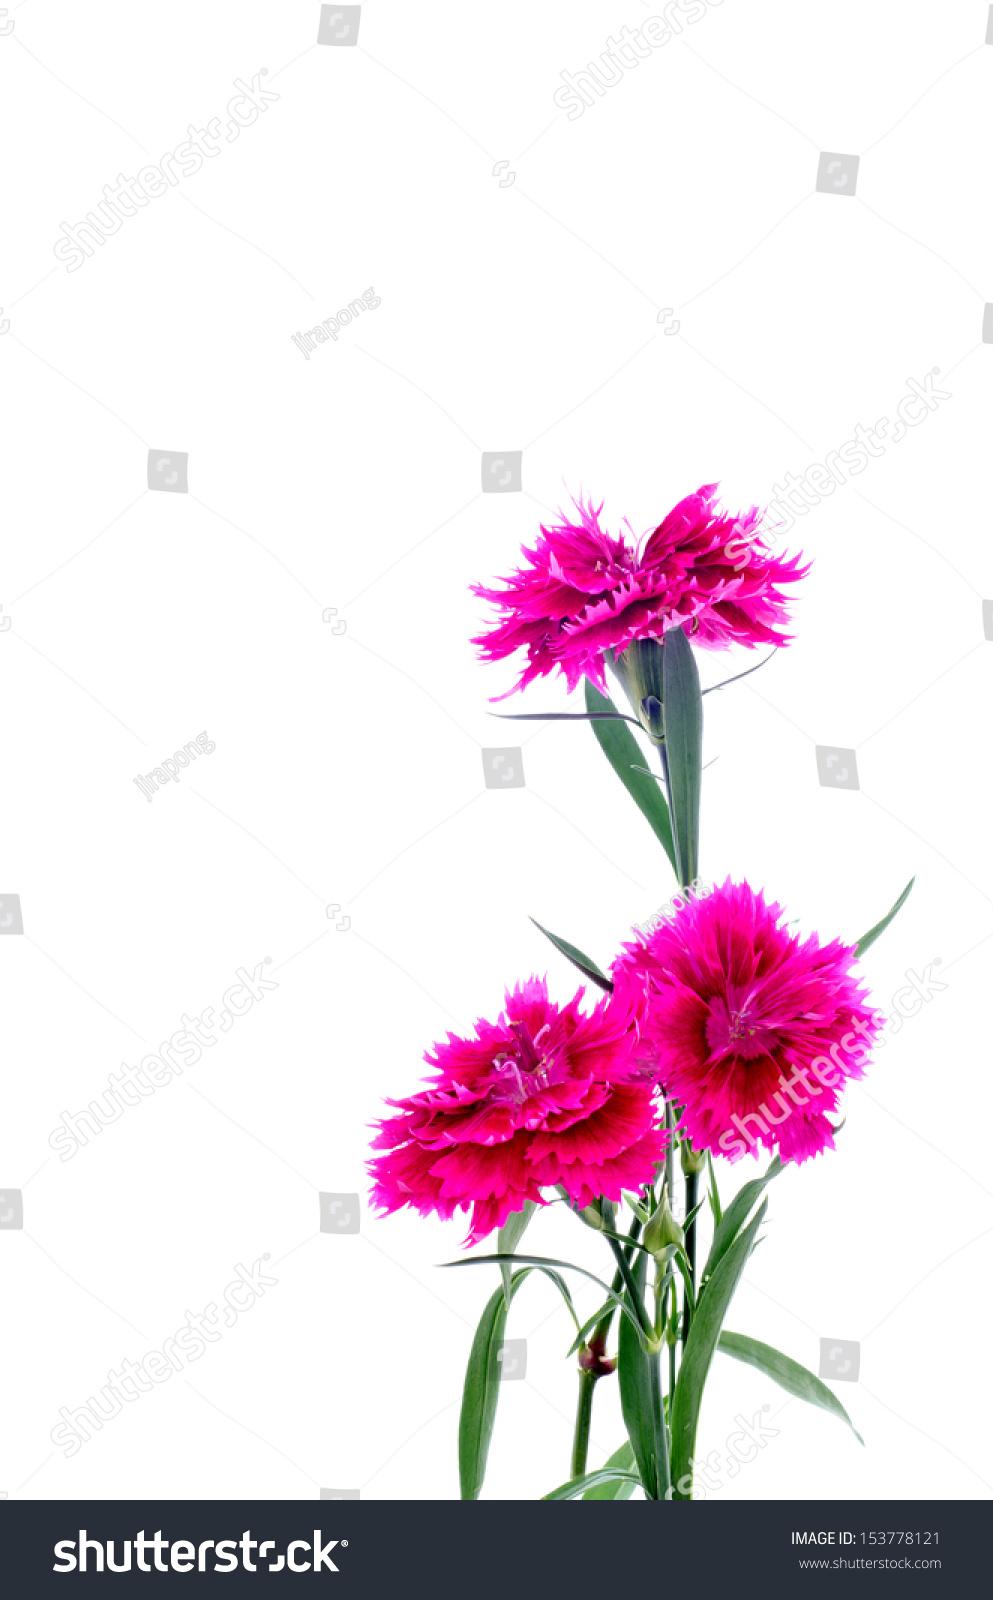 Dianthus Or Sweet William Flower On White Background Ez Canvas